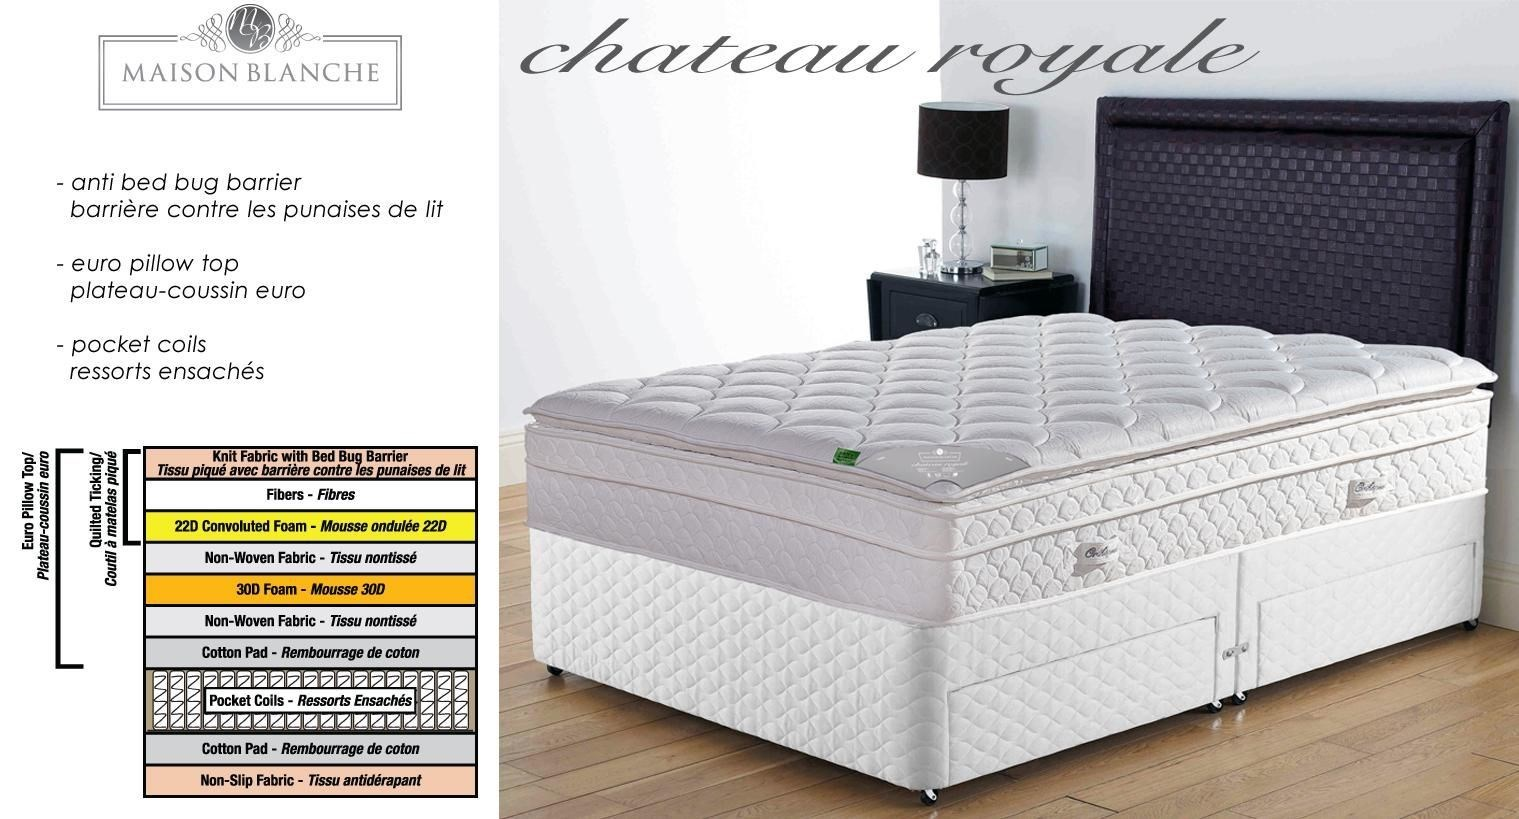 Chateau Royale Whi Mattress 137x203x35cm Fxl Pocket Coil Ressorts